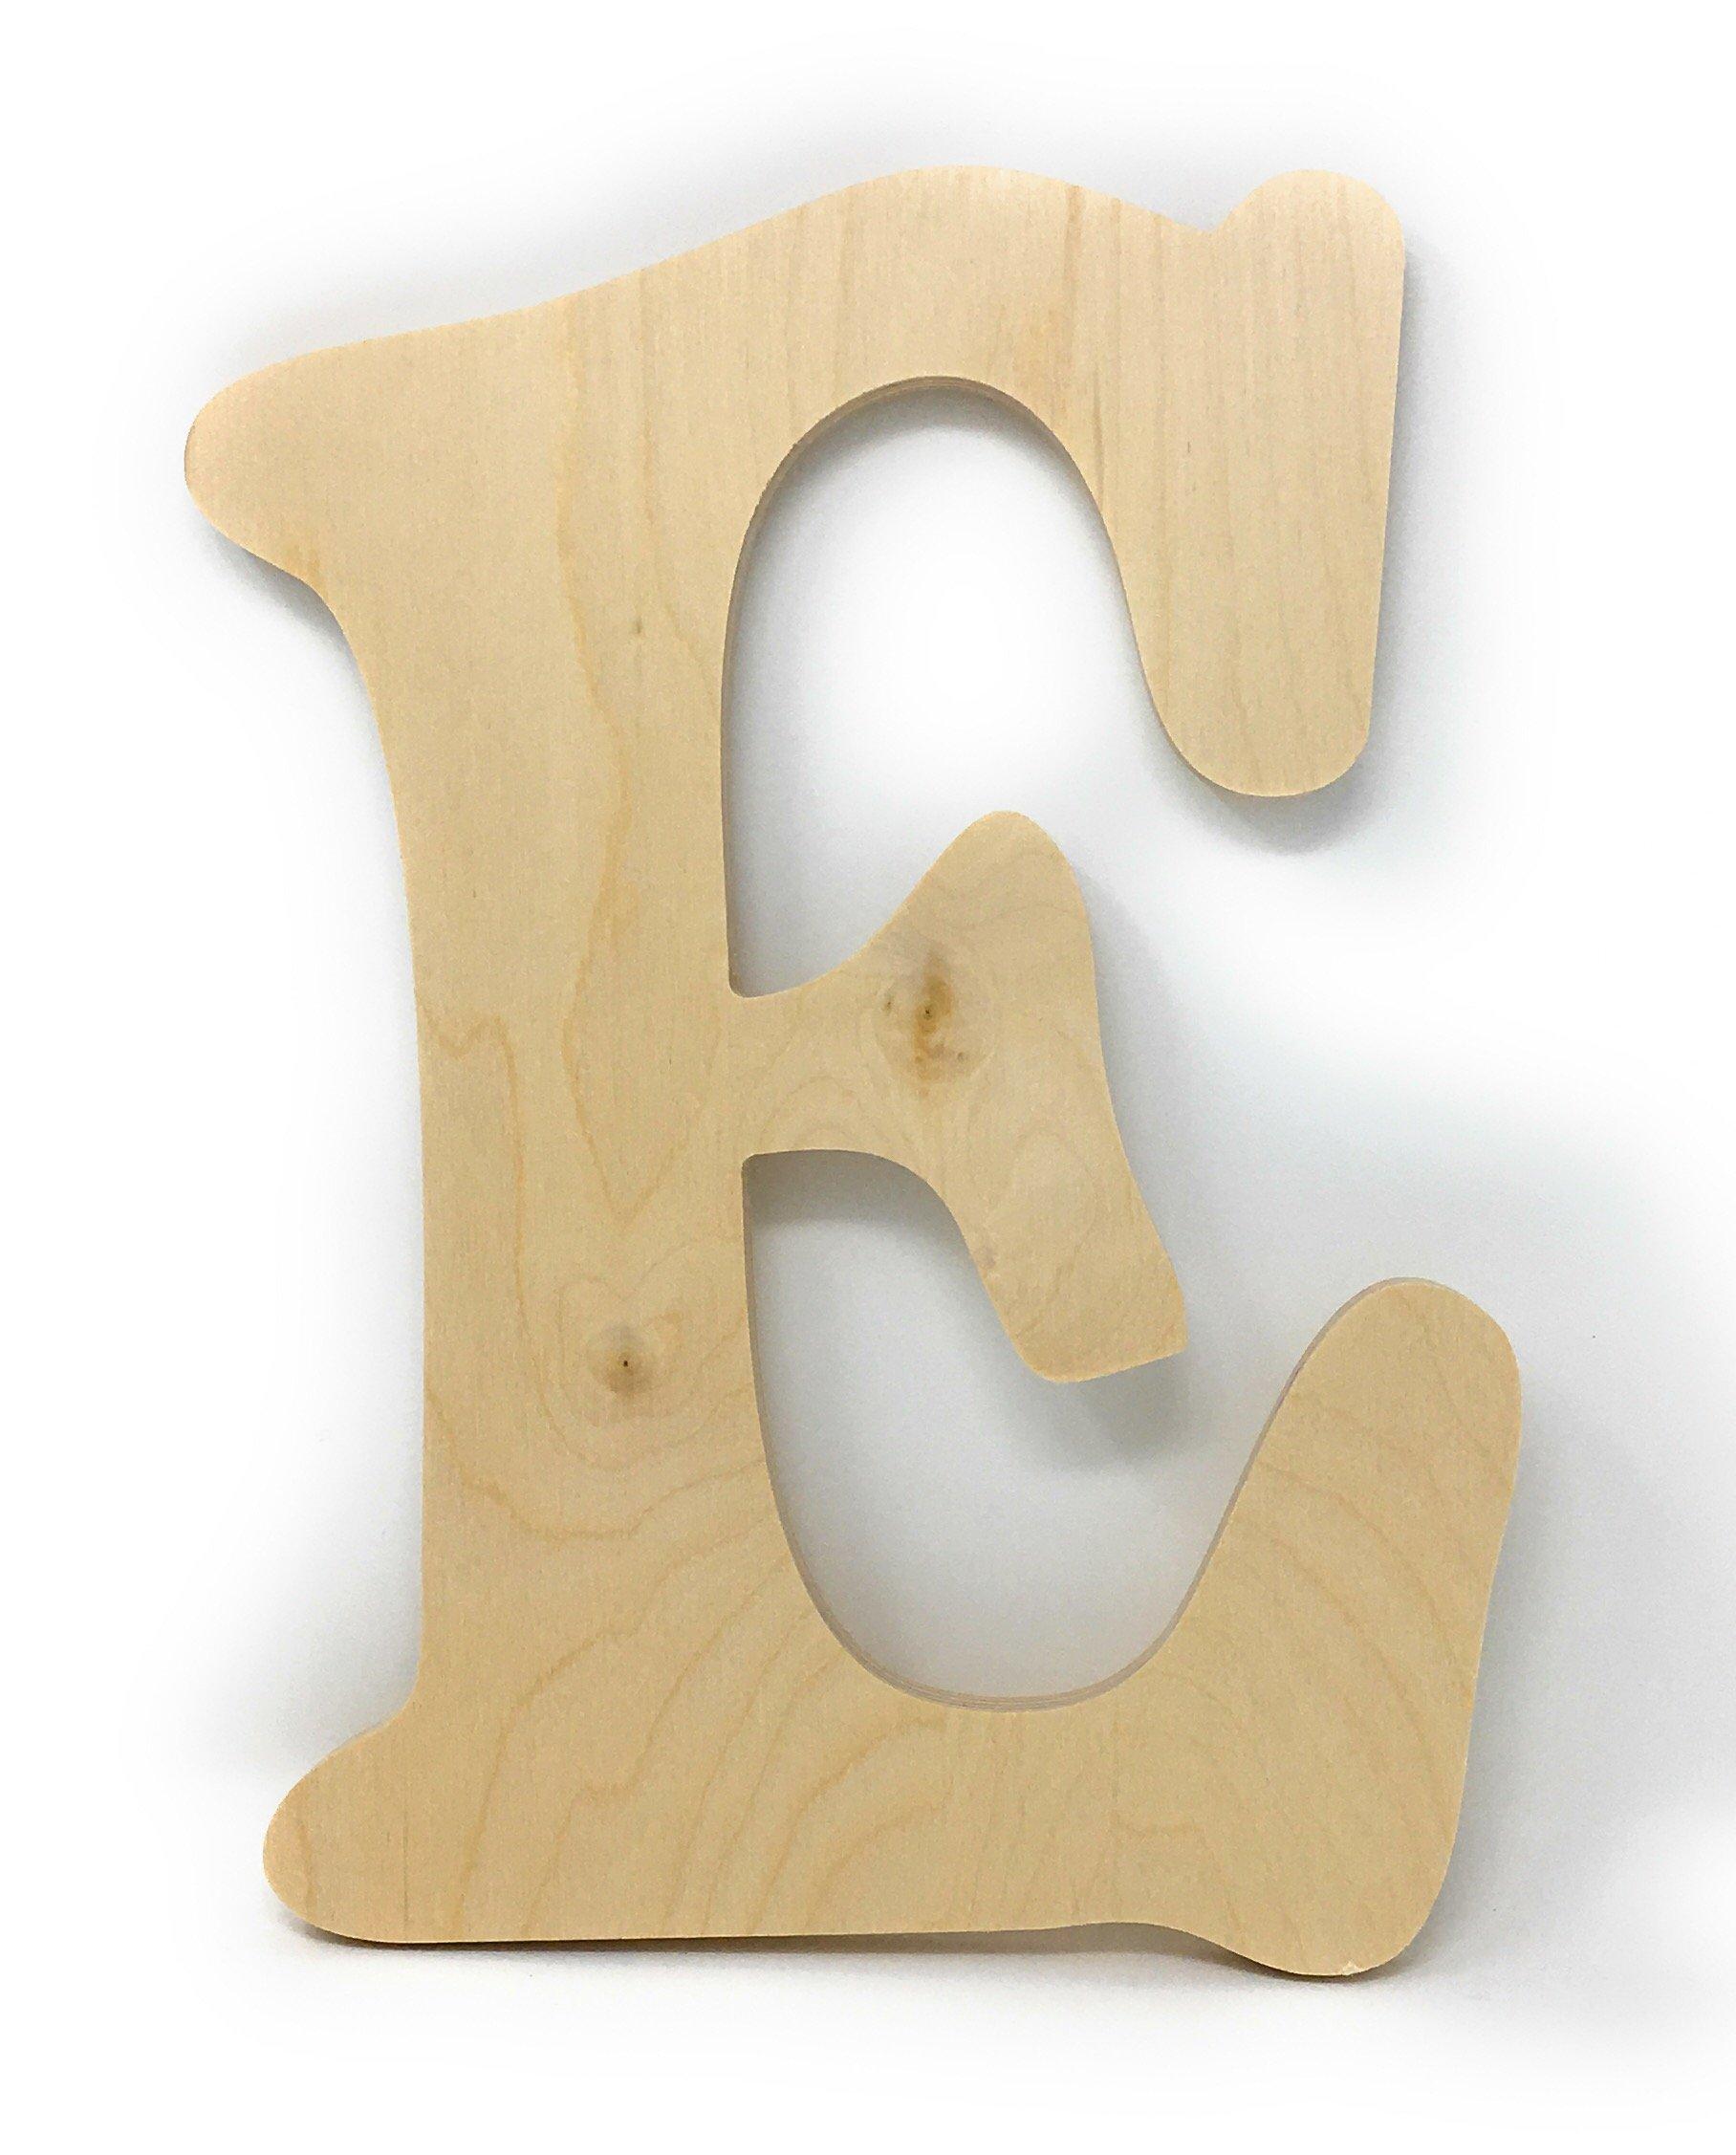 Best wooden block letters for decor | Amazon.com